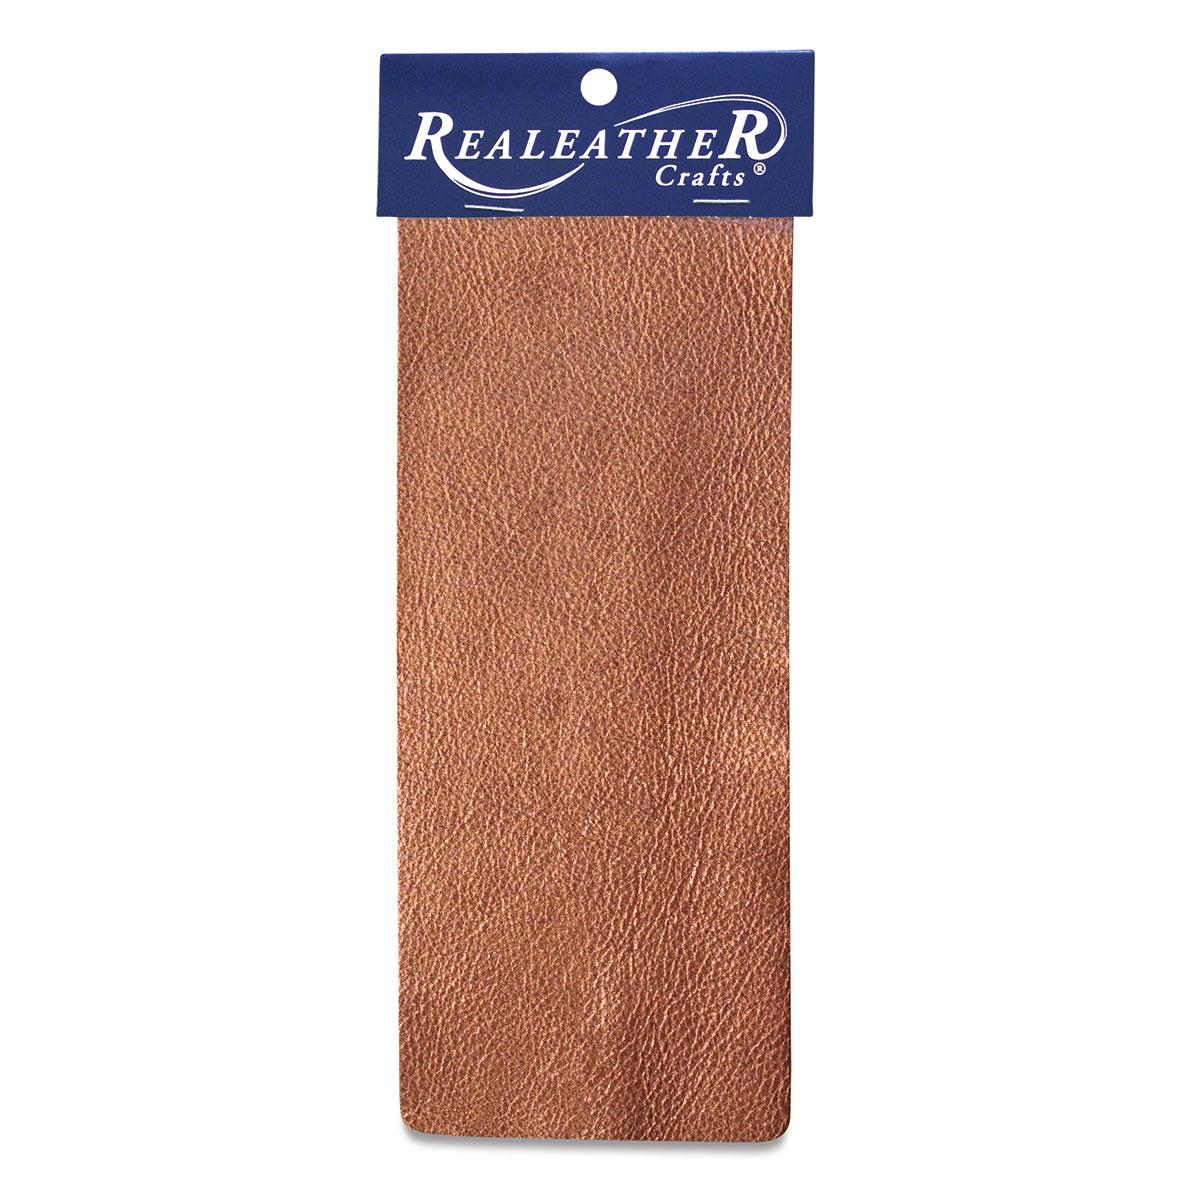 Realeather Crafts Suede Trim Piece 8-1//2X11-Black